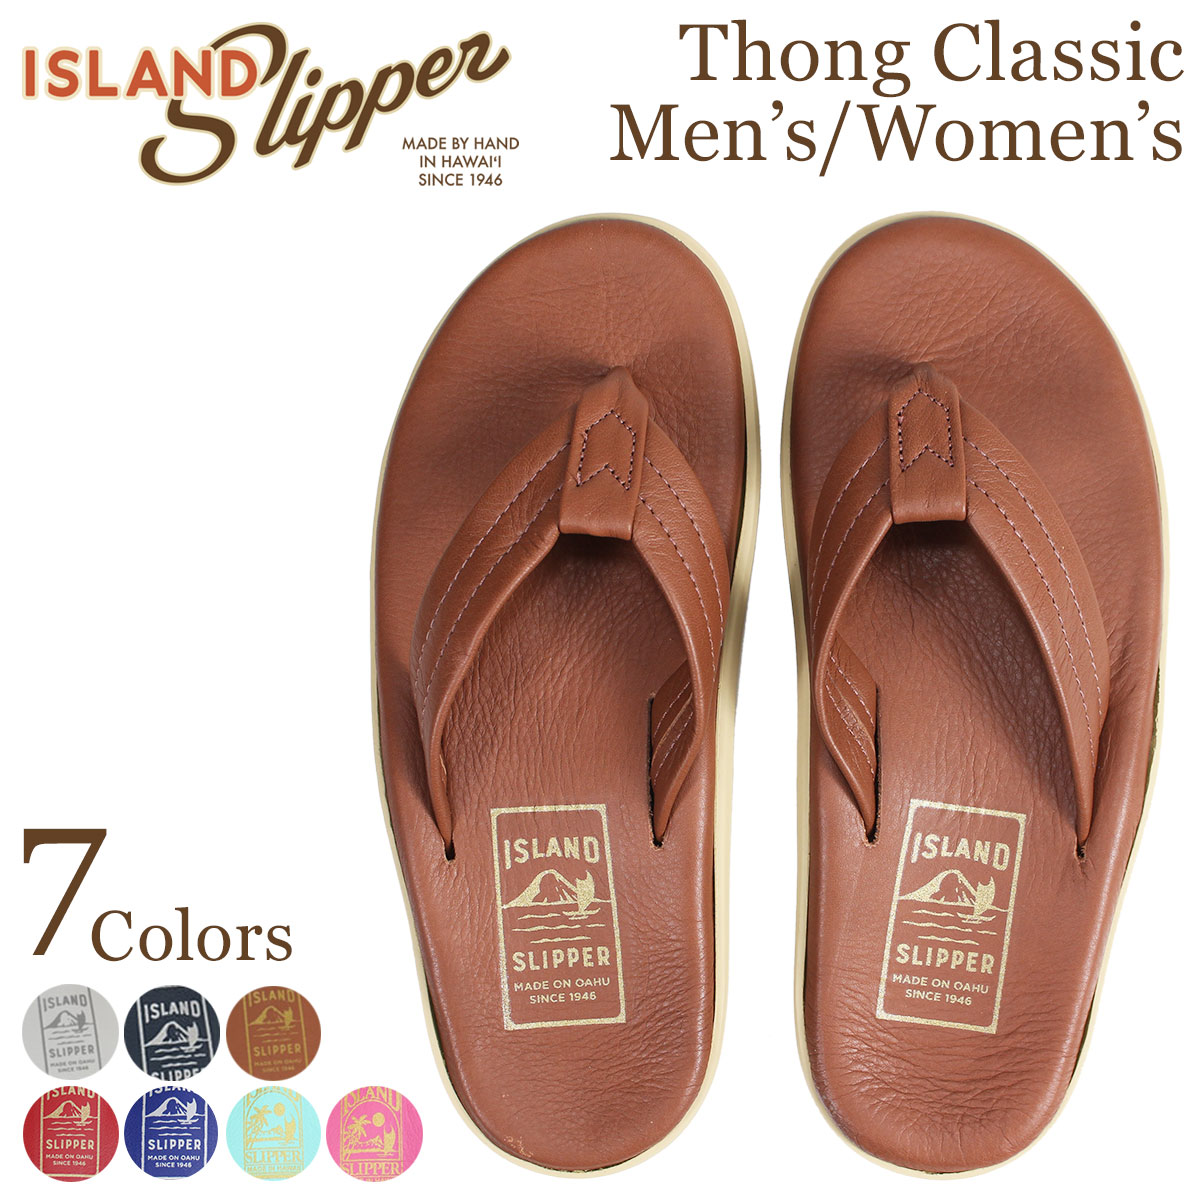 ISLAND SLIPPER アイランドスリッパ クラシック サンダル トングサンダル メンズ レディース レザー THONG CLASSIC PT202 [3/22 追加入荷]